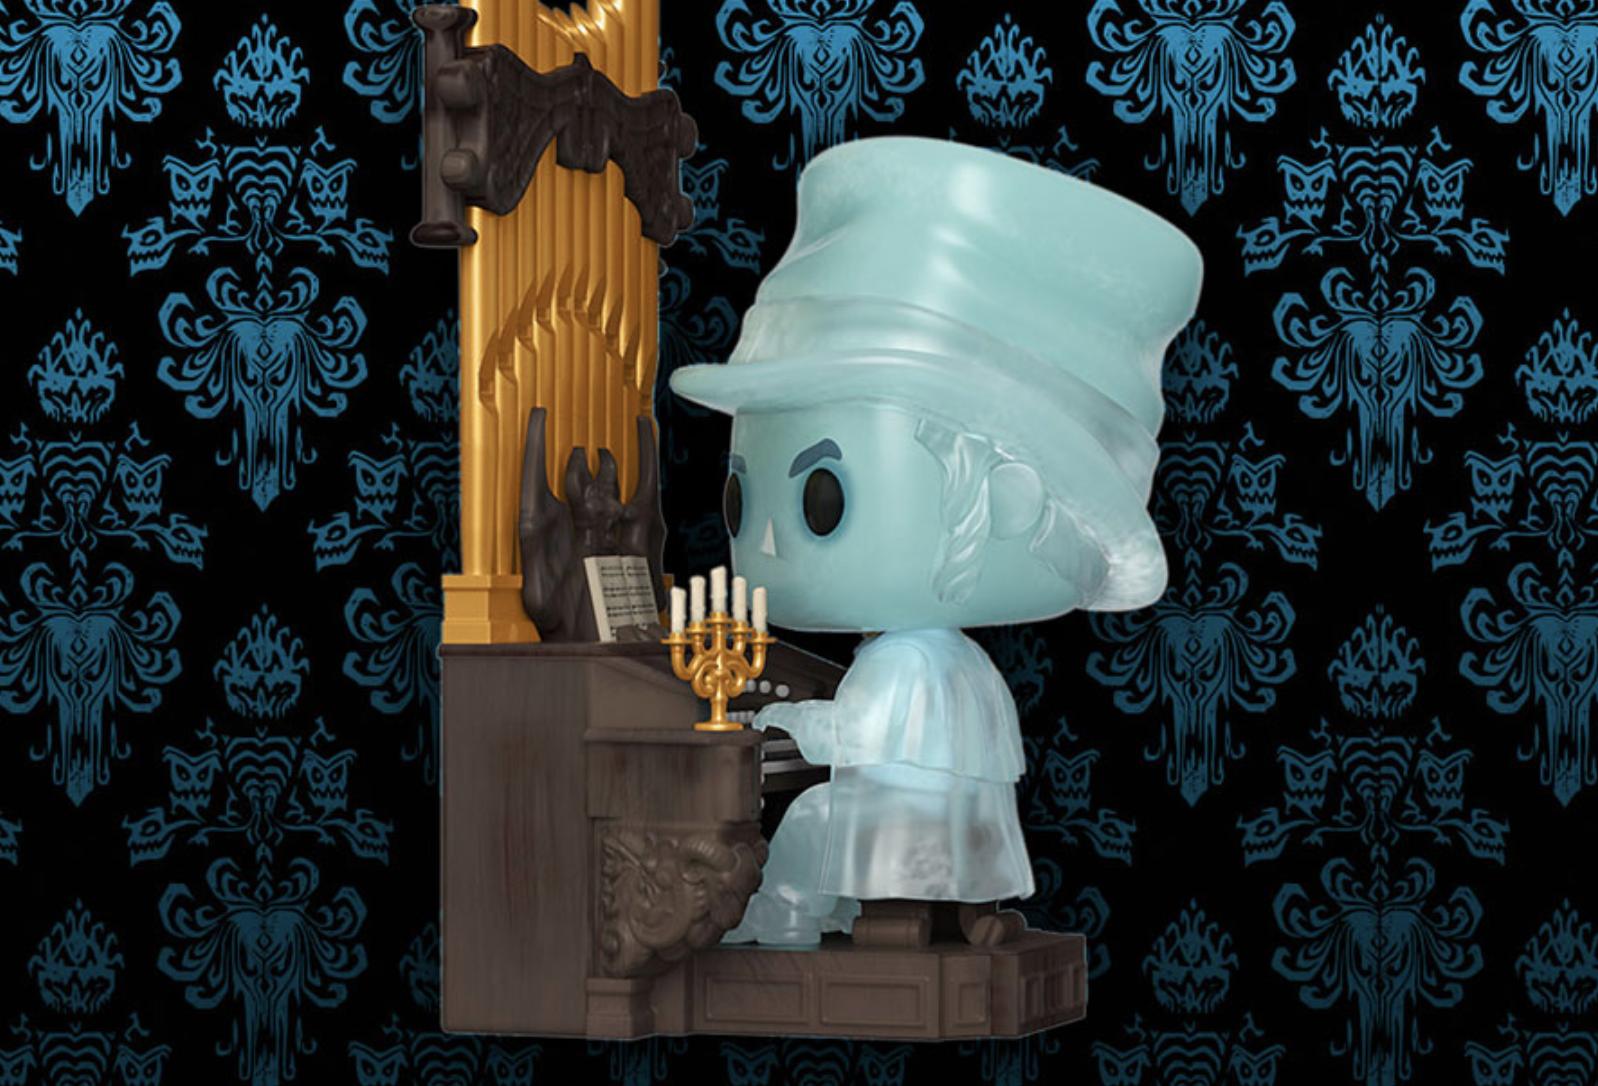 Haunted Mansion Halloween 2020 Haunted Mansion' Organist Funko Pop! Highlights Disney Parks